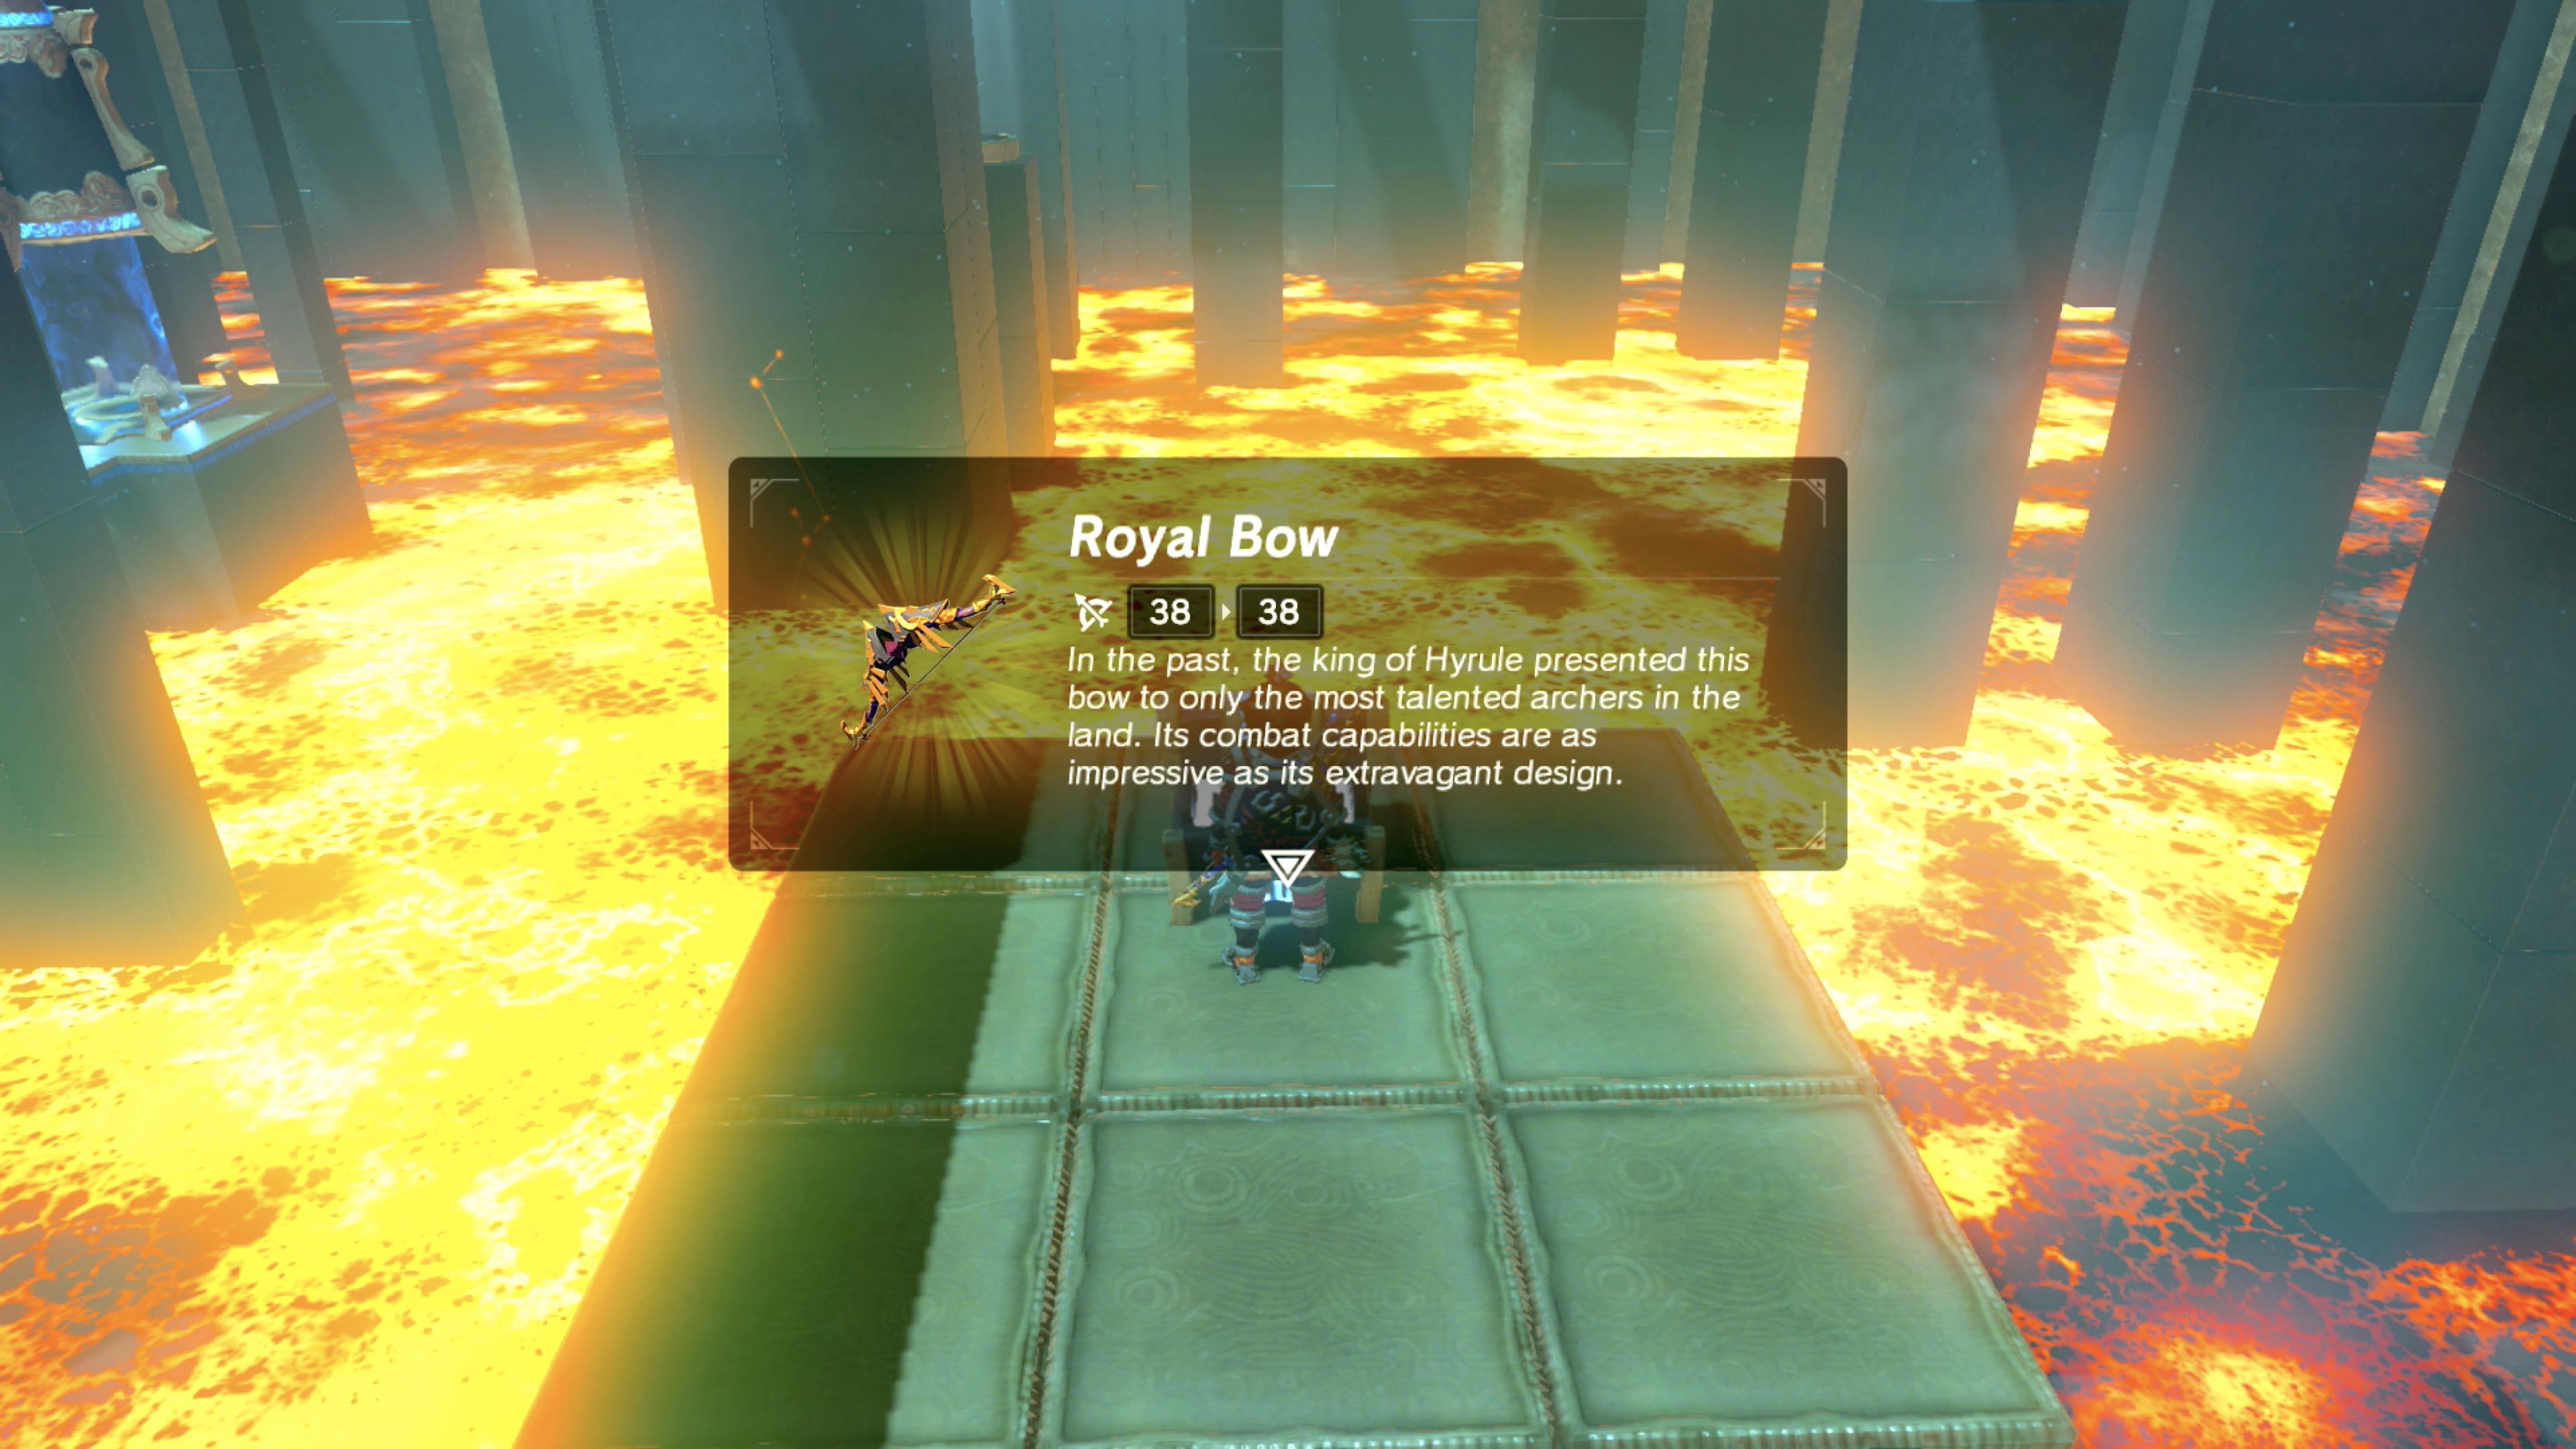 Zelda: Breath of the Wild guide: Shora Hah shrine location